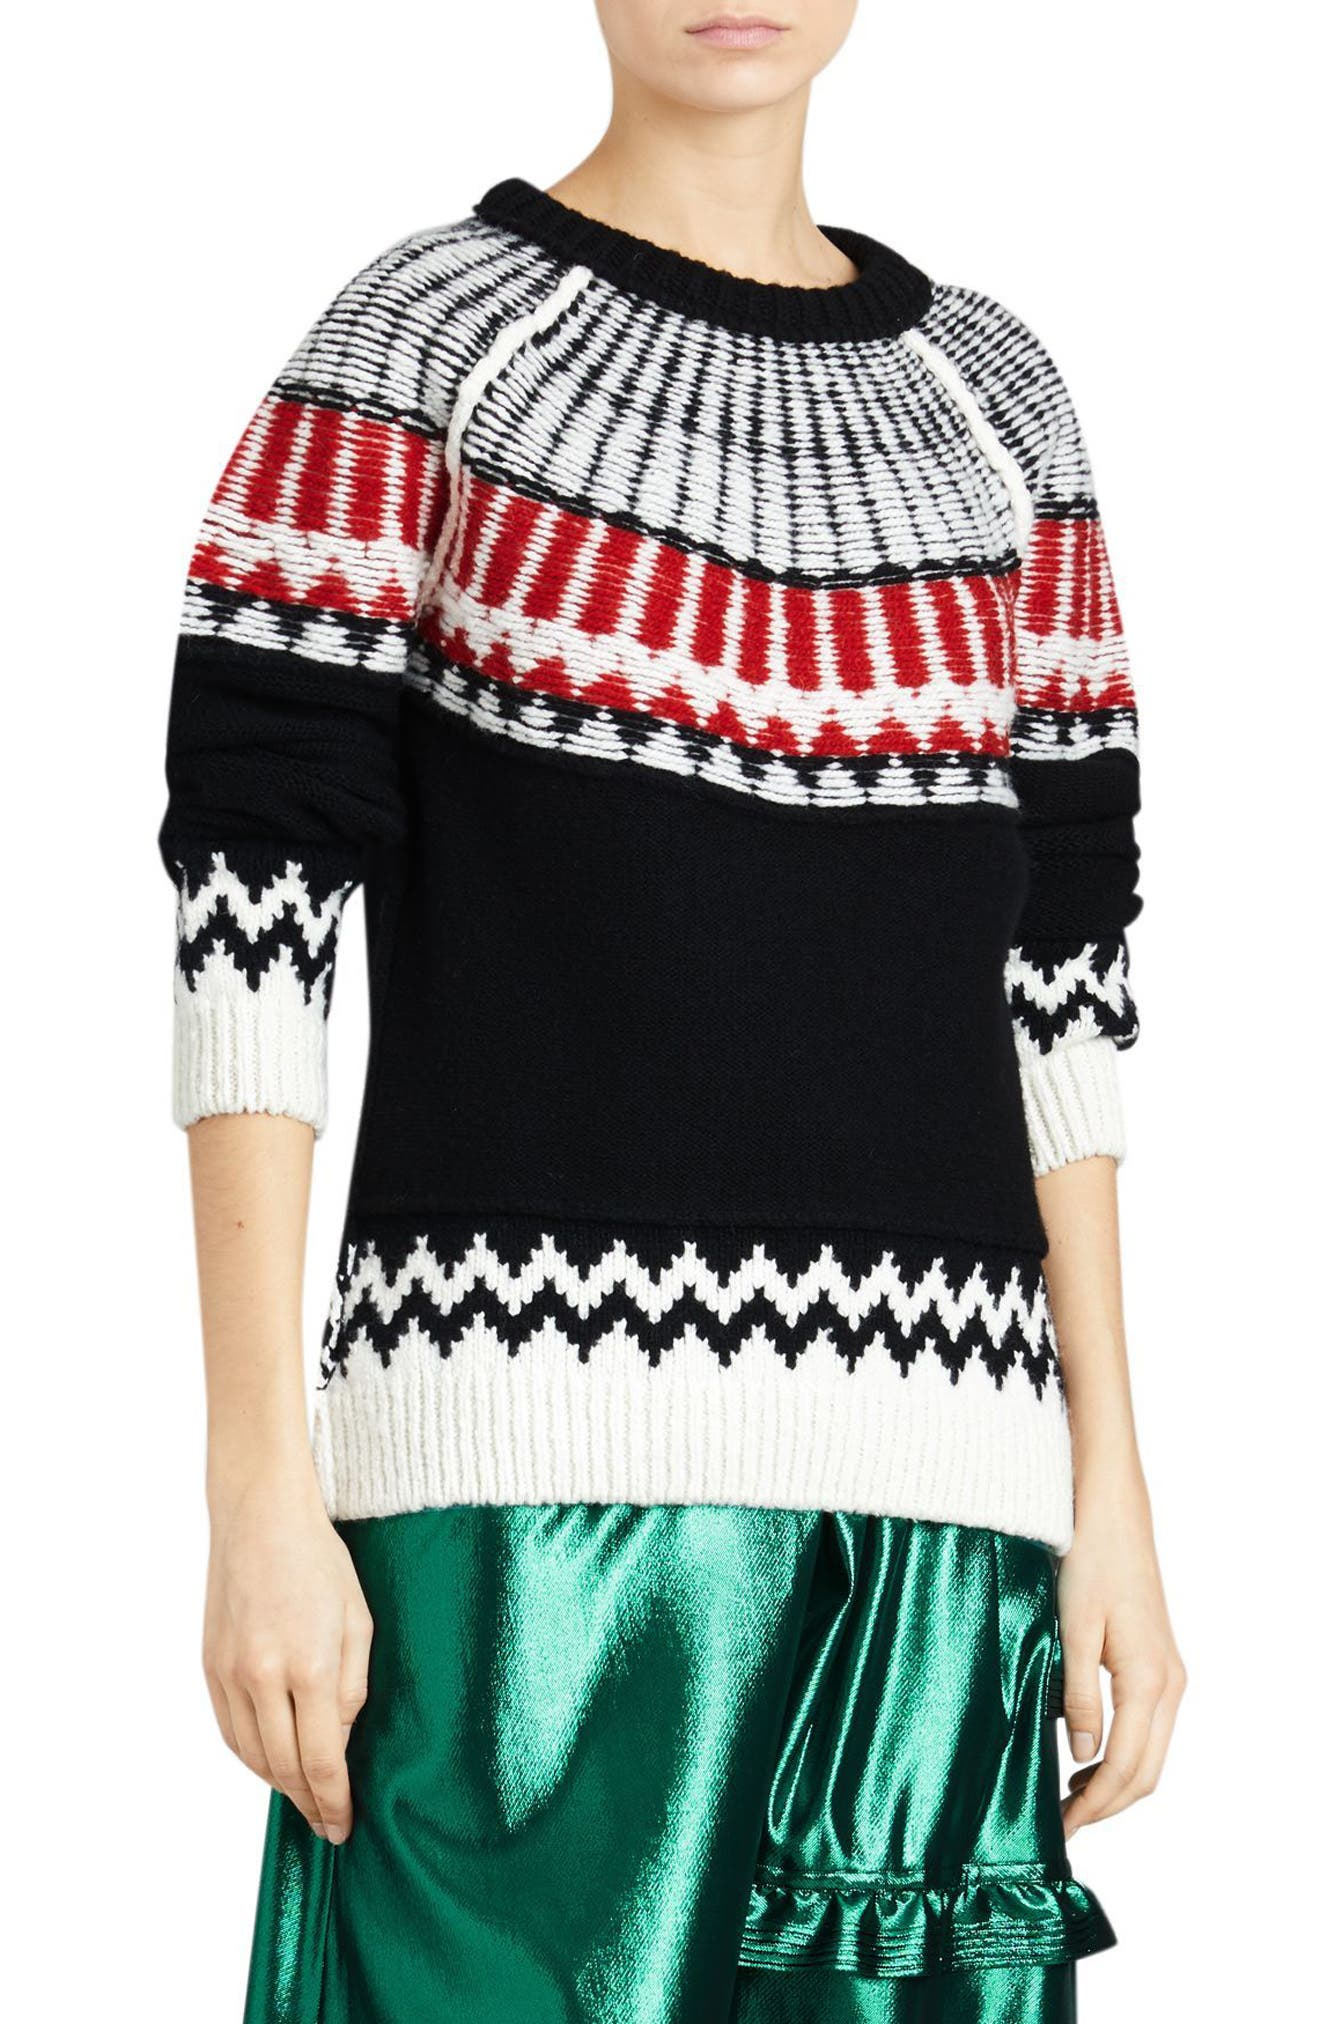 Burberry Trycroft Fair Isle Wool Blend Sweater